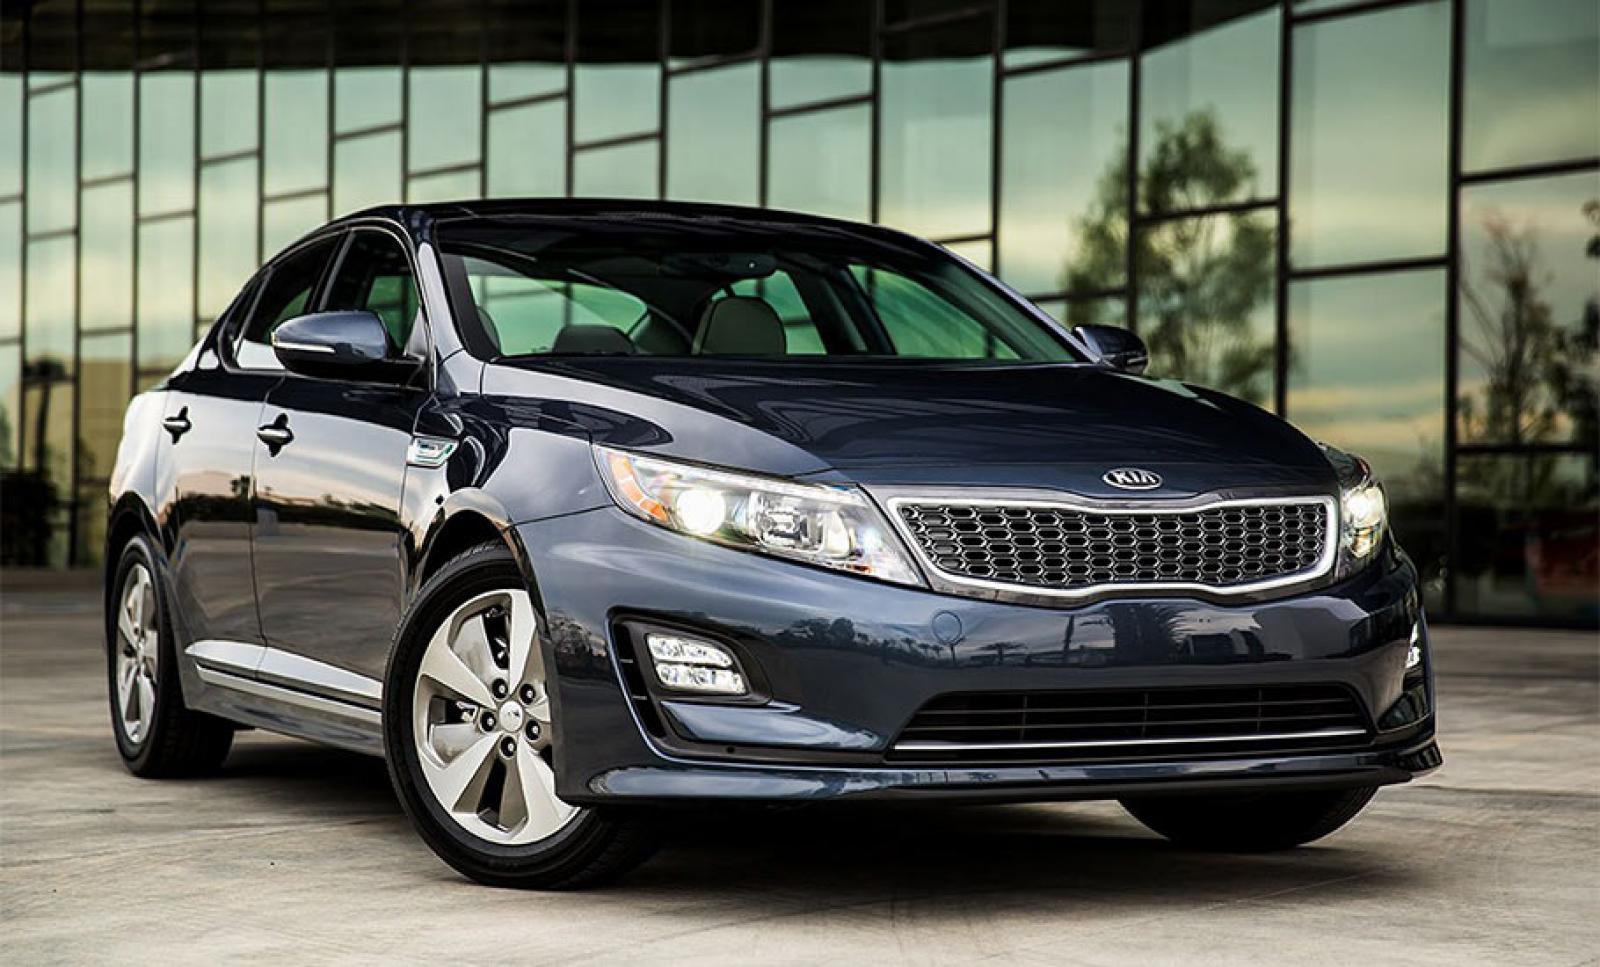 drives chase optima hybrid test car attachment autos kia drive ca